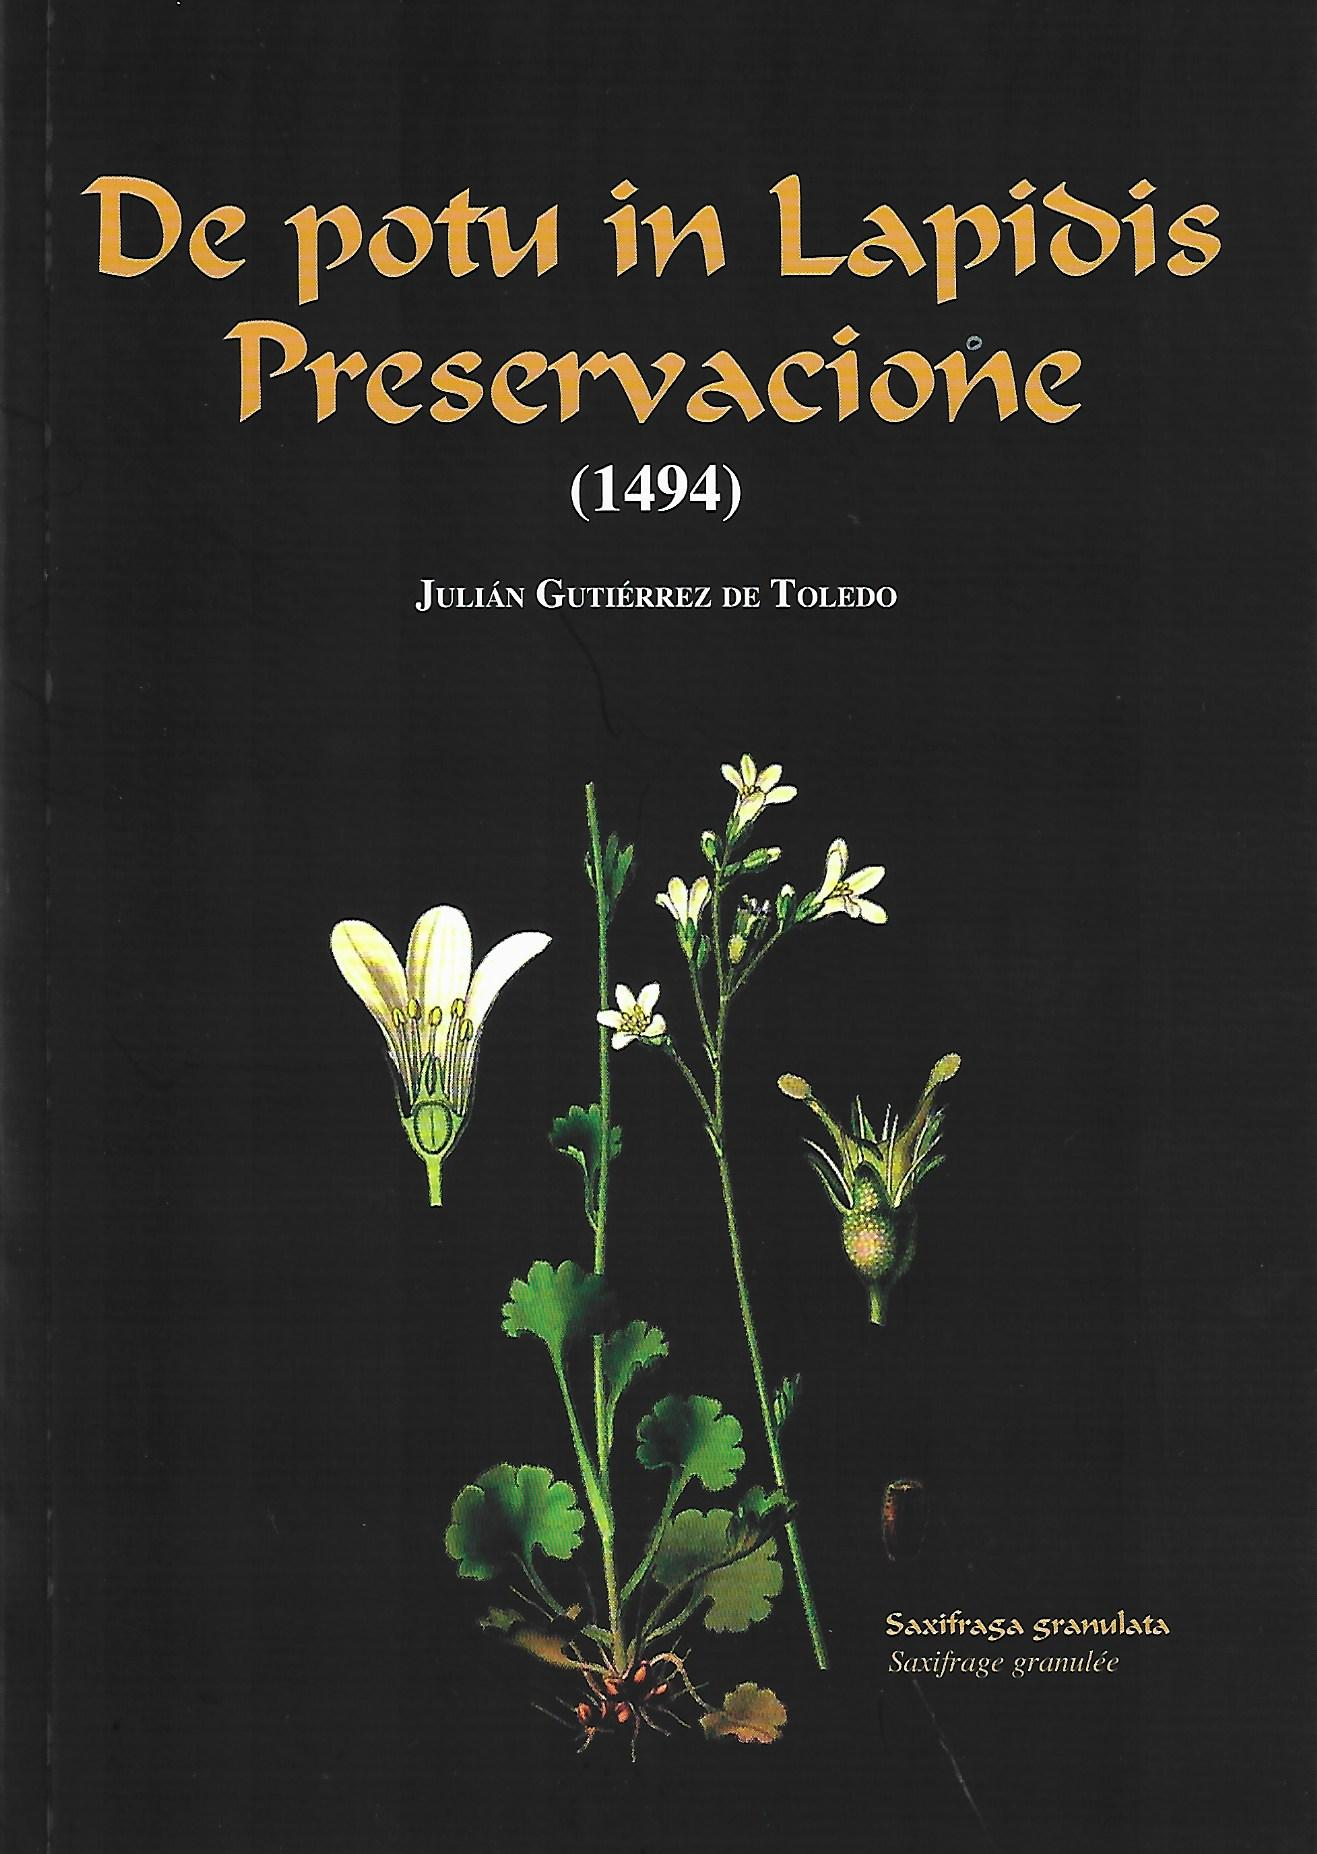 De potu in Lapidus preservacione (1494)